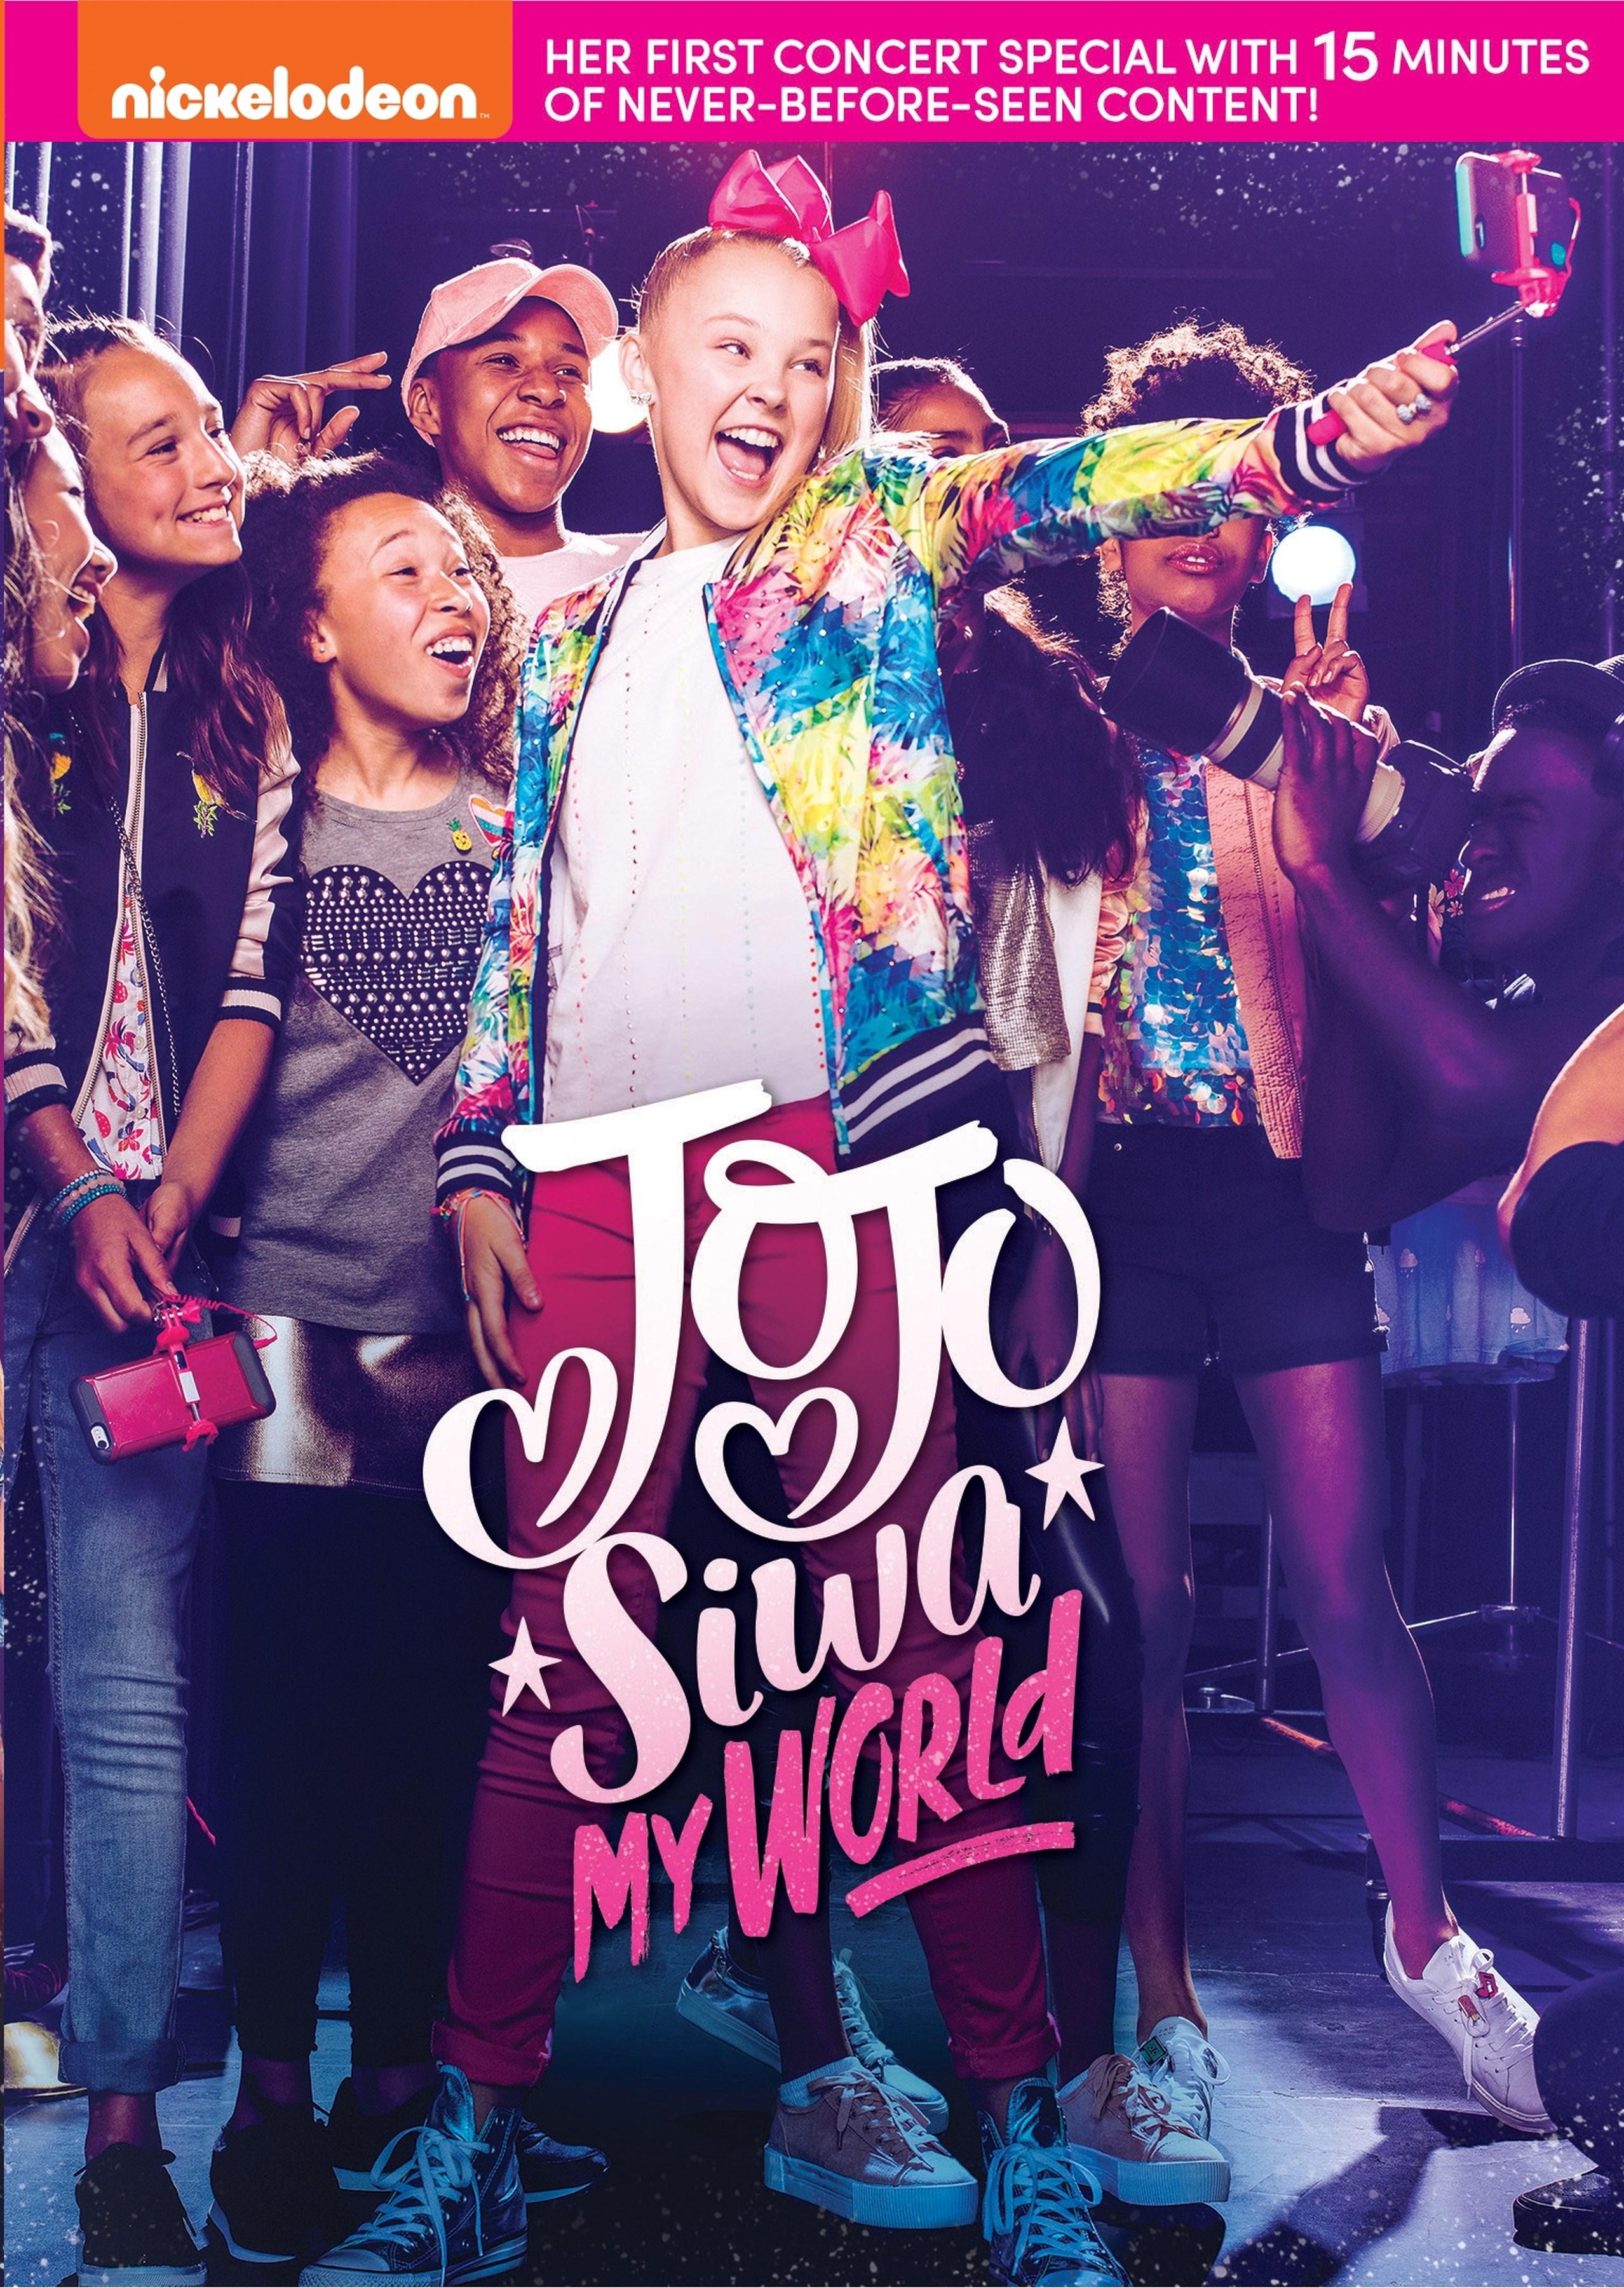 JoJo Siwa: My World (2018 DVD)